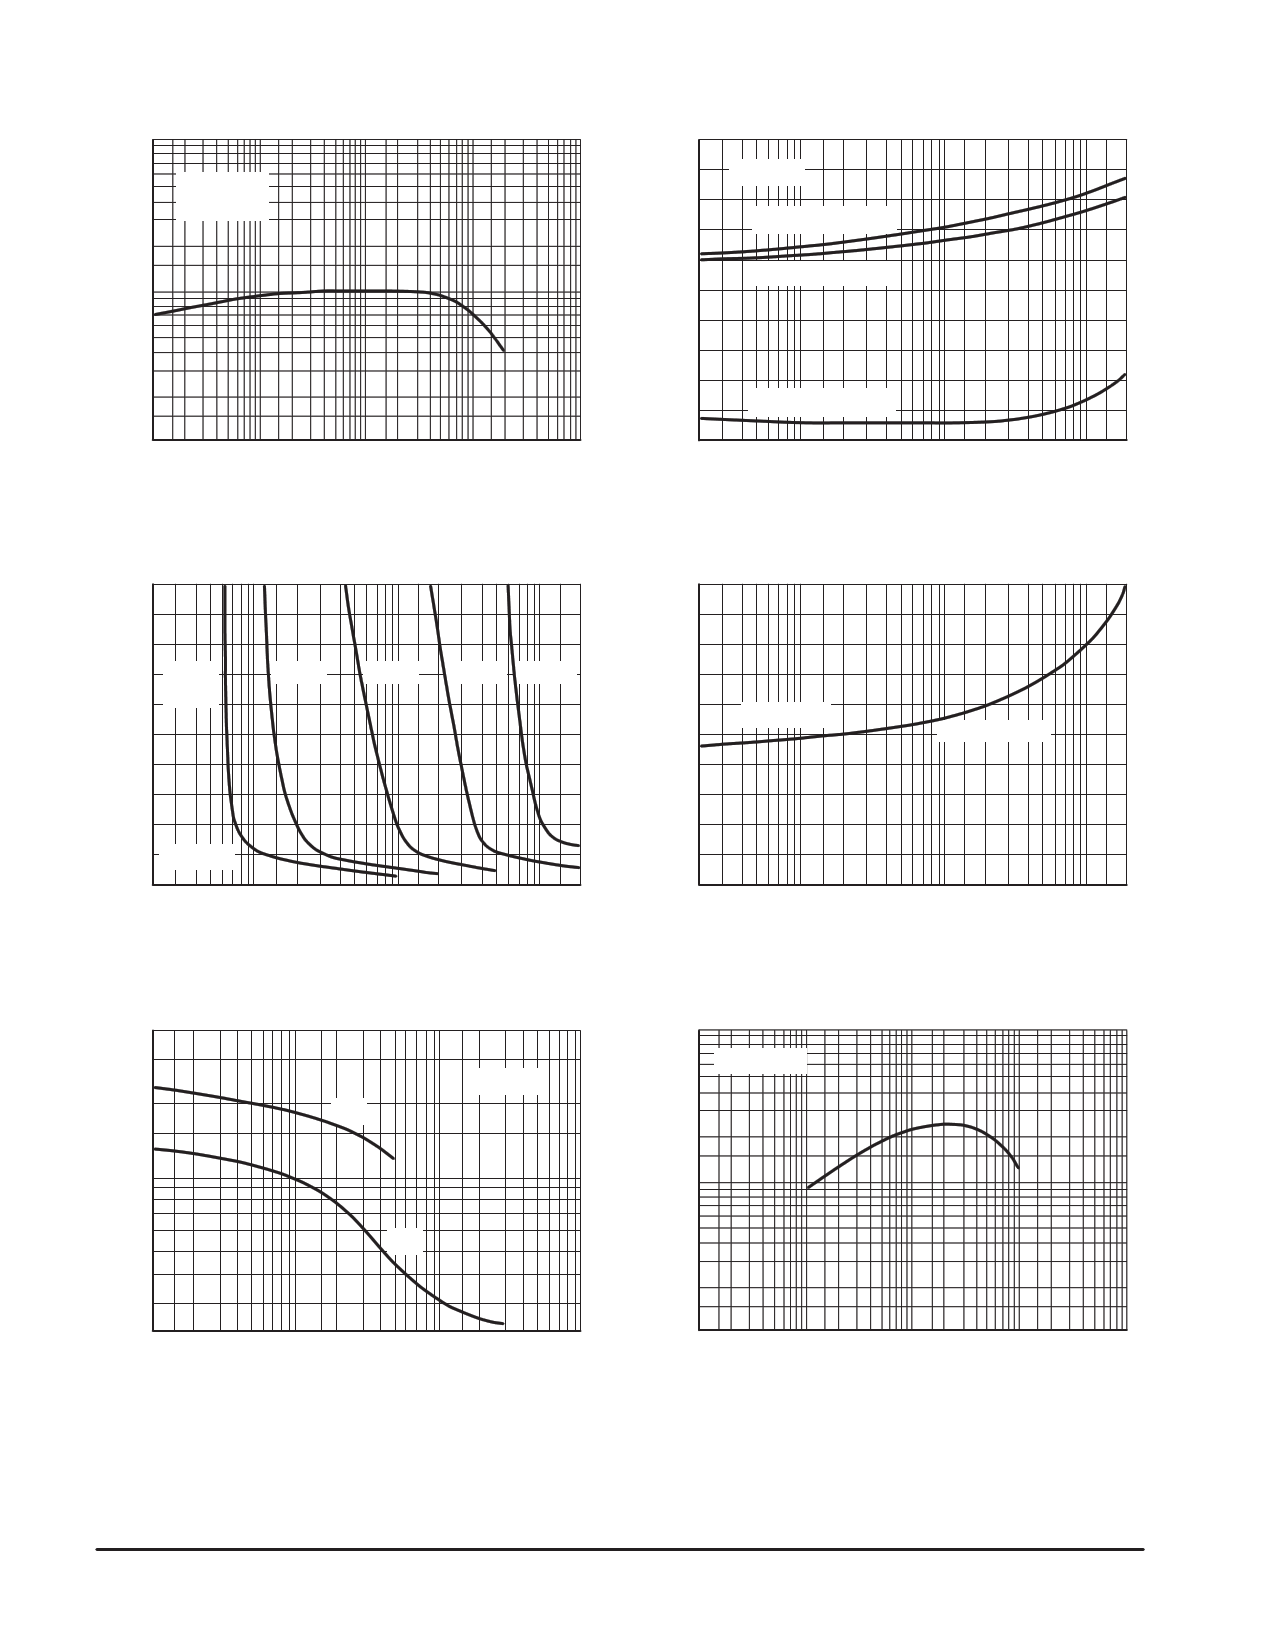 BC557 pdf, 반도체, 판매, 대치품